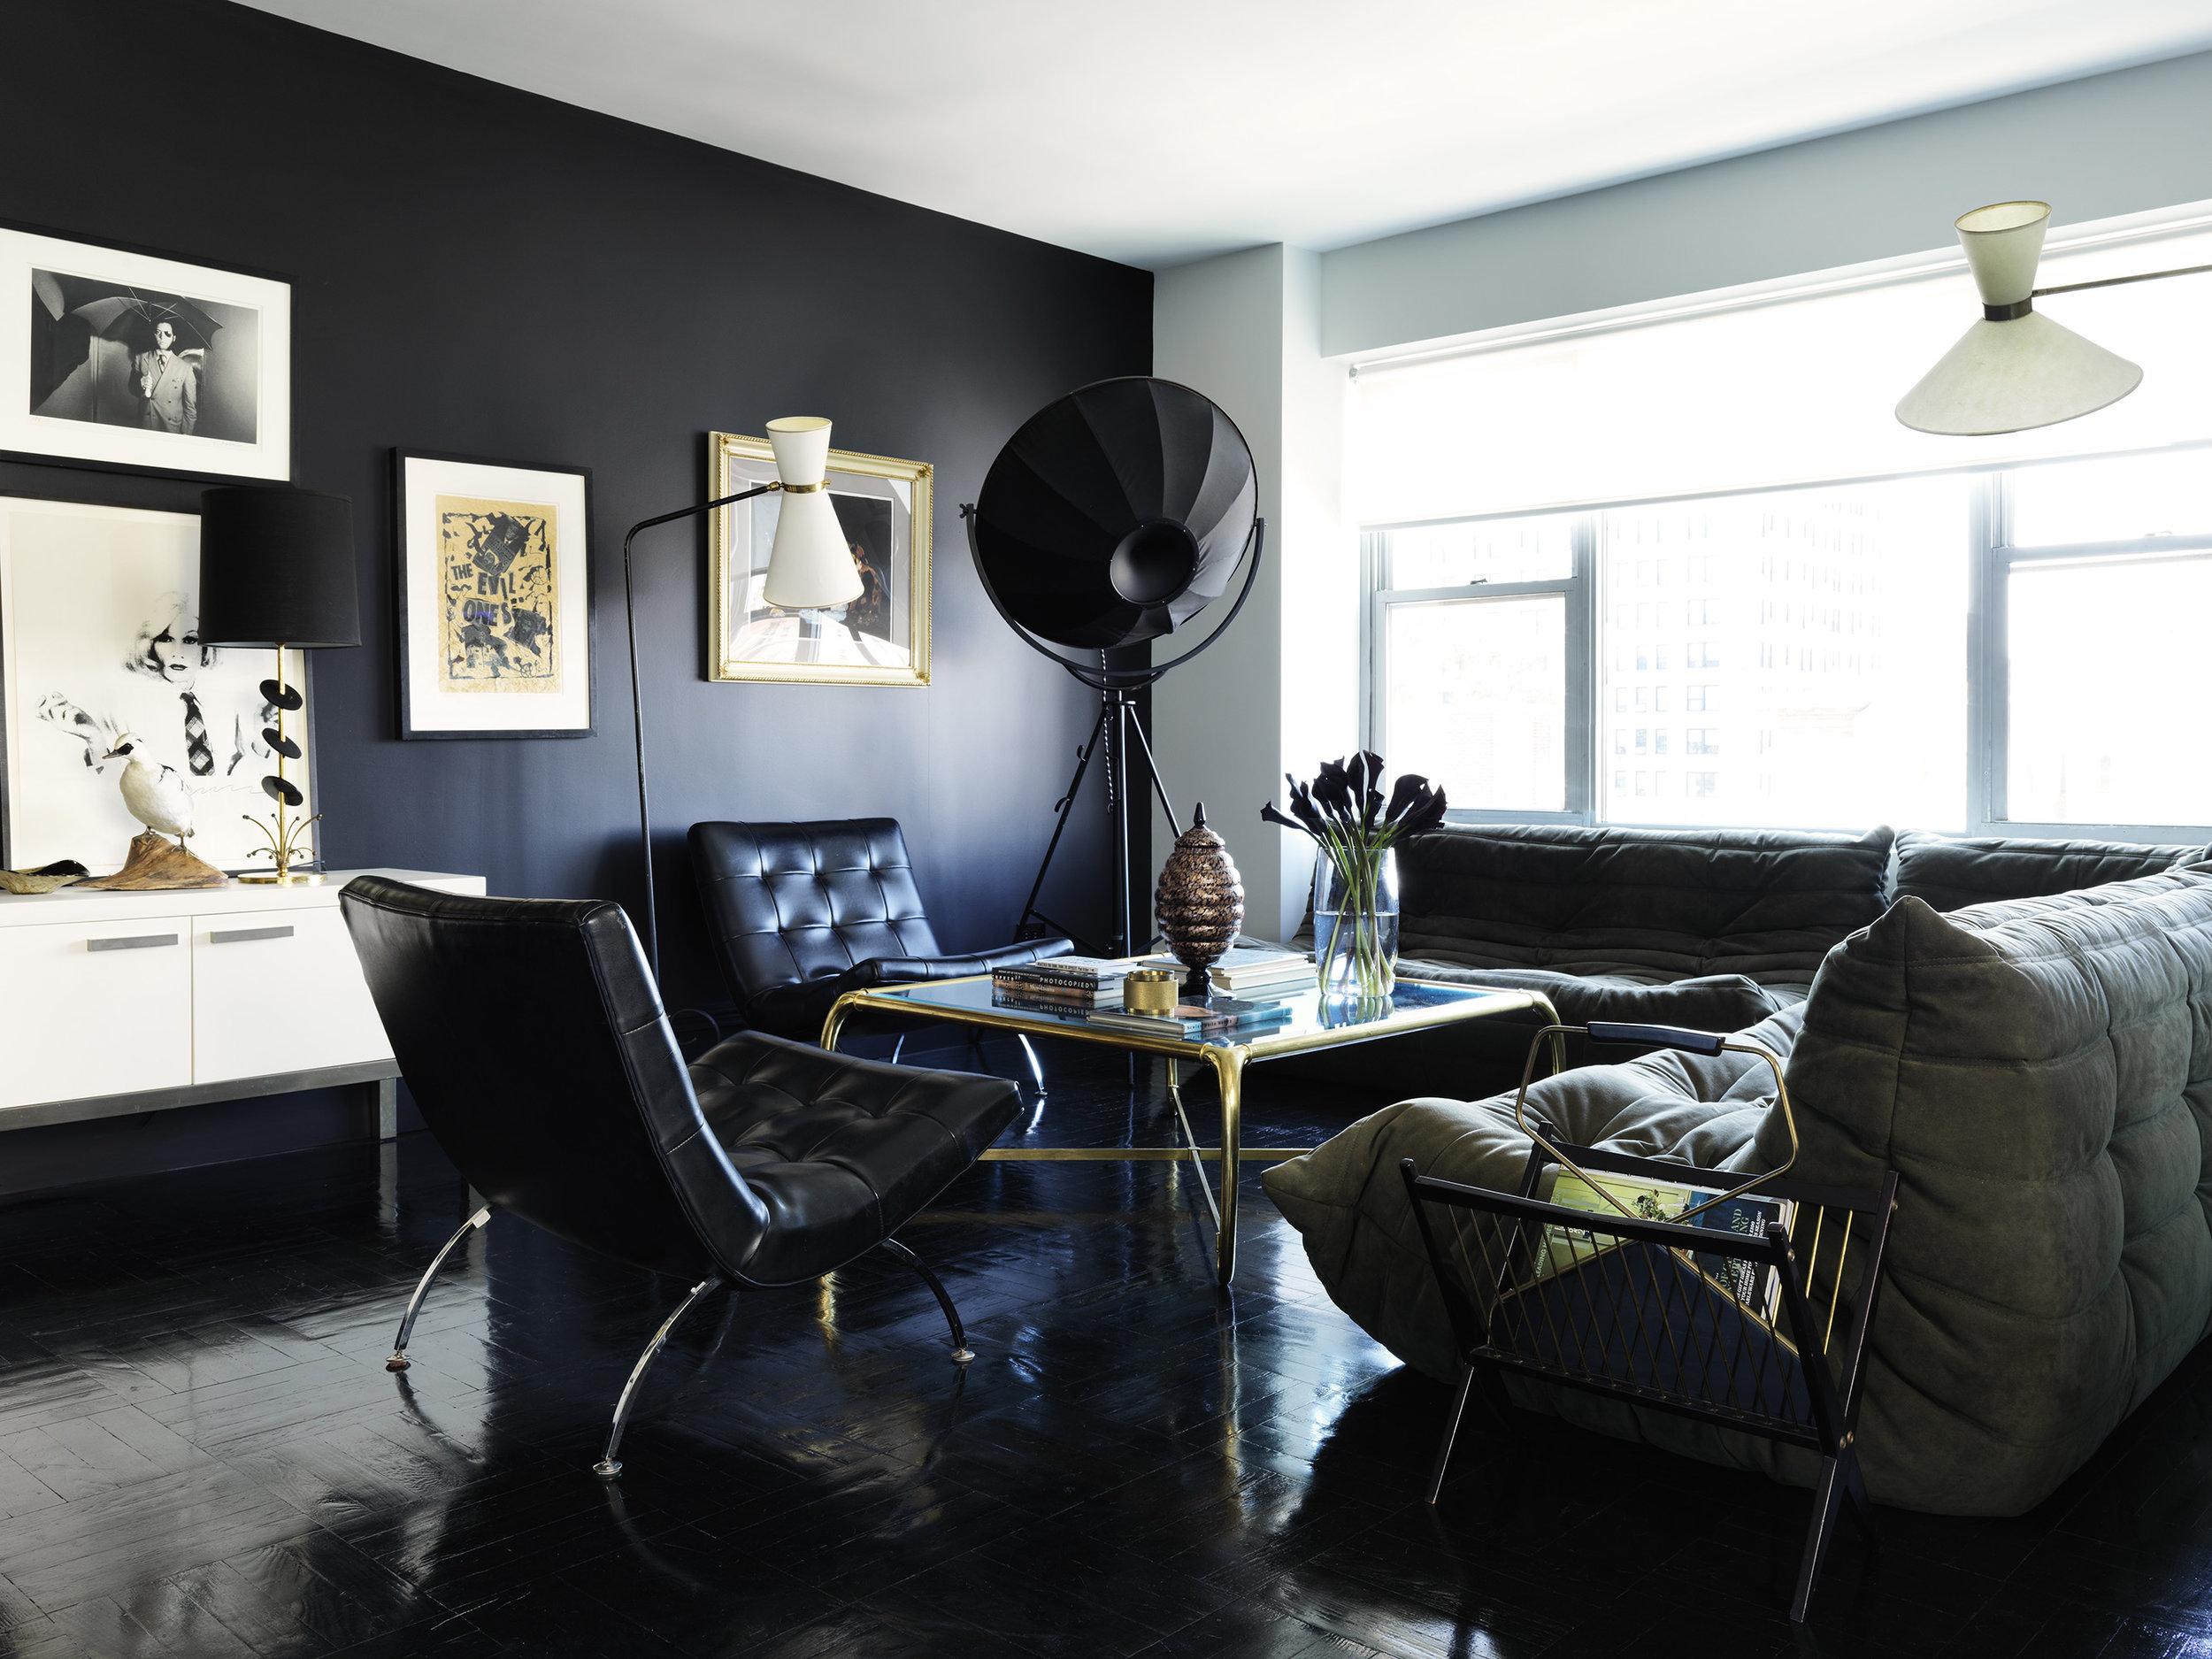 Robyns_Apartment_136.jpg